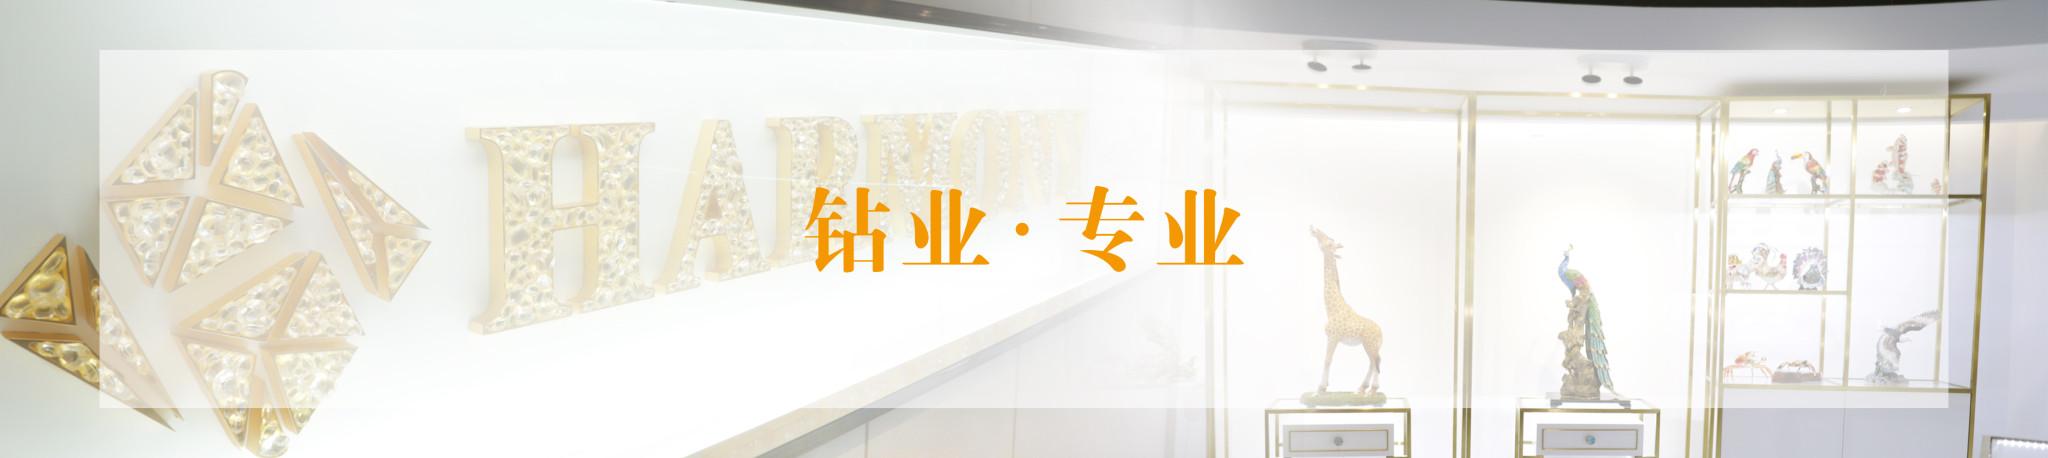 关于我们  公司环境banner